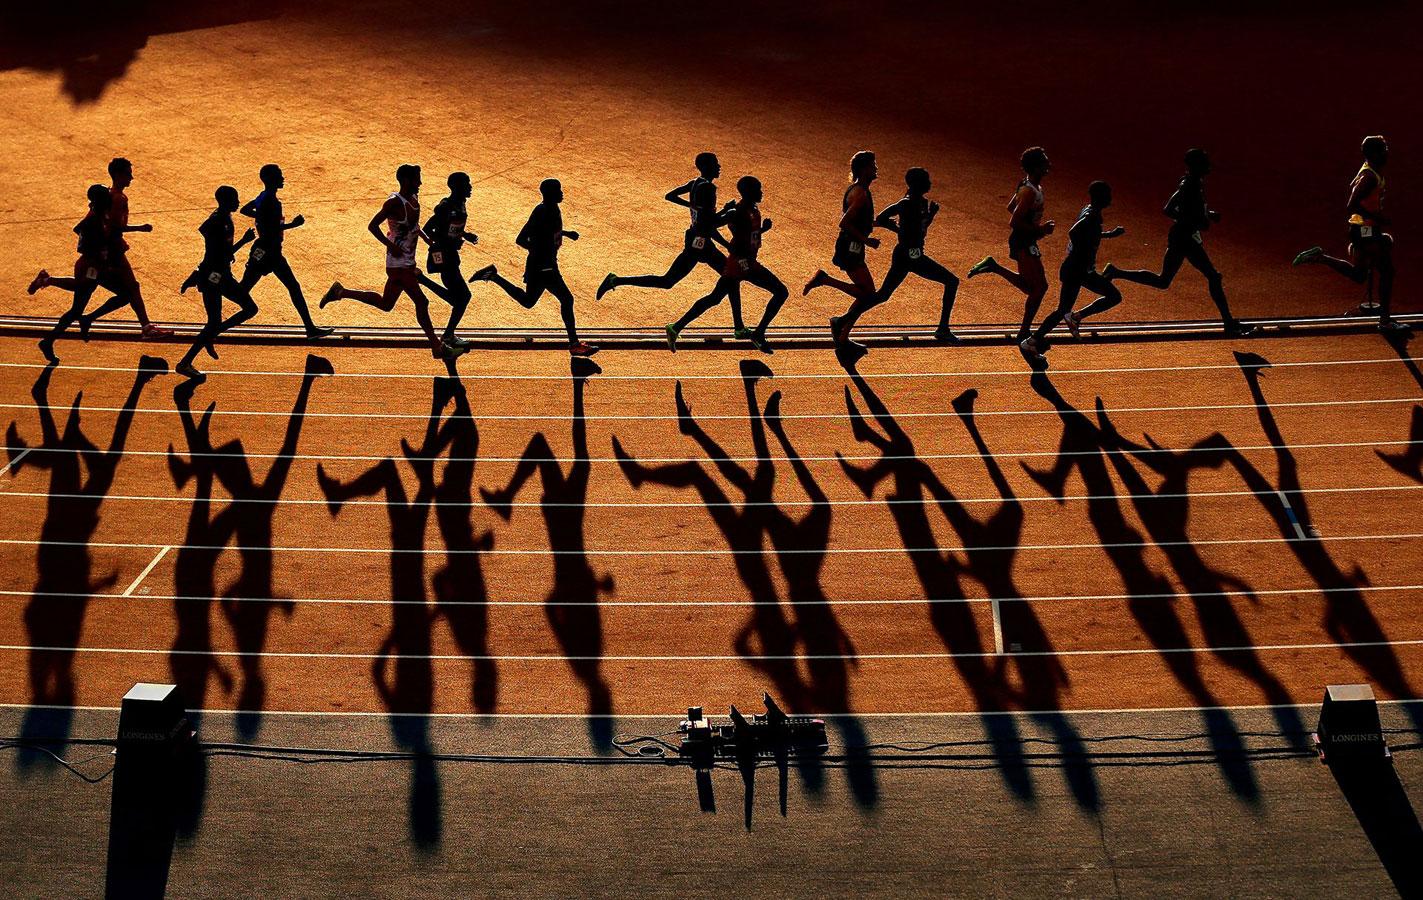 Фантастический свет, © Алекс Ливси, Великобритания, 3 место, Фотоконкурс Siena